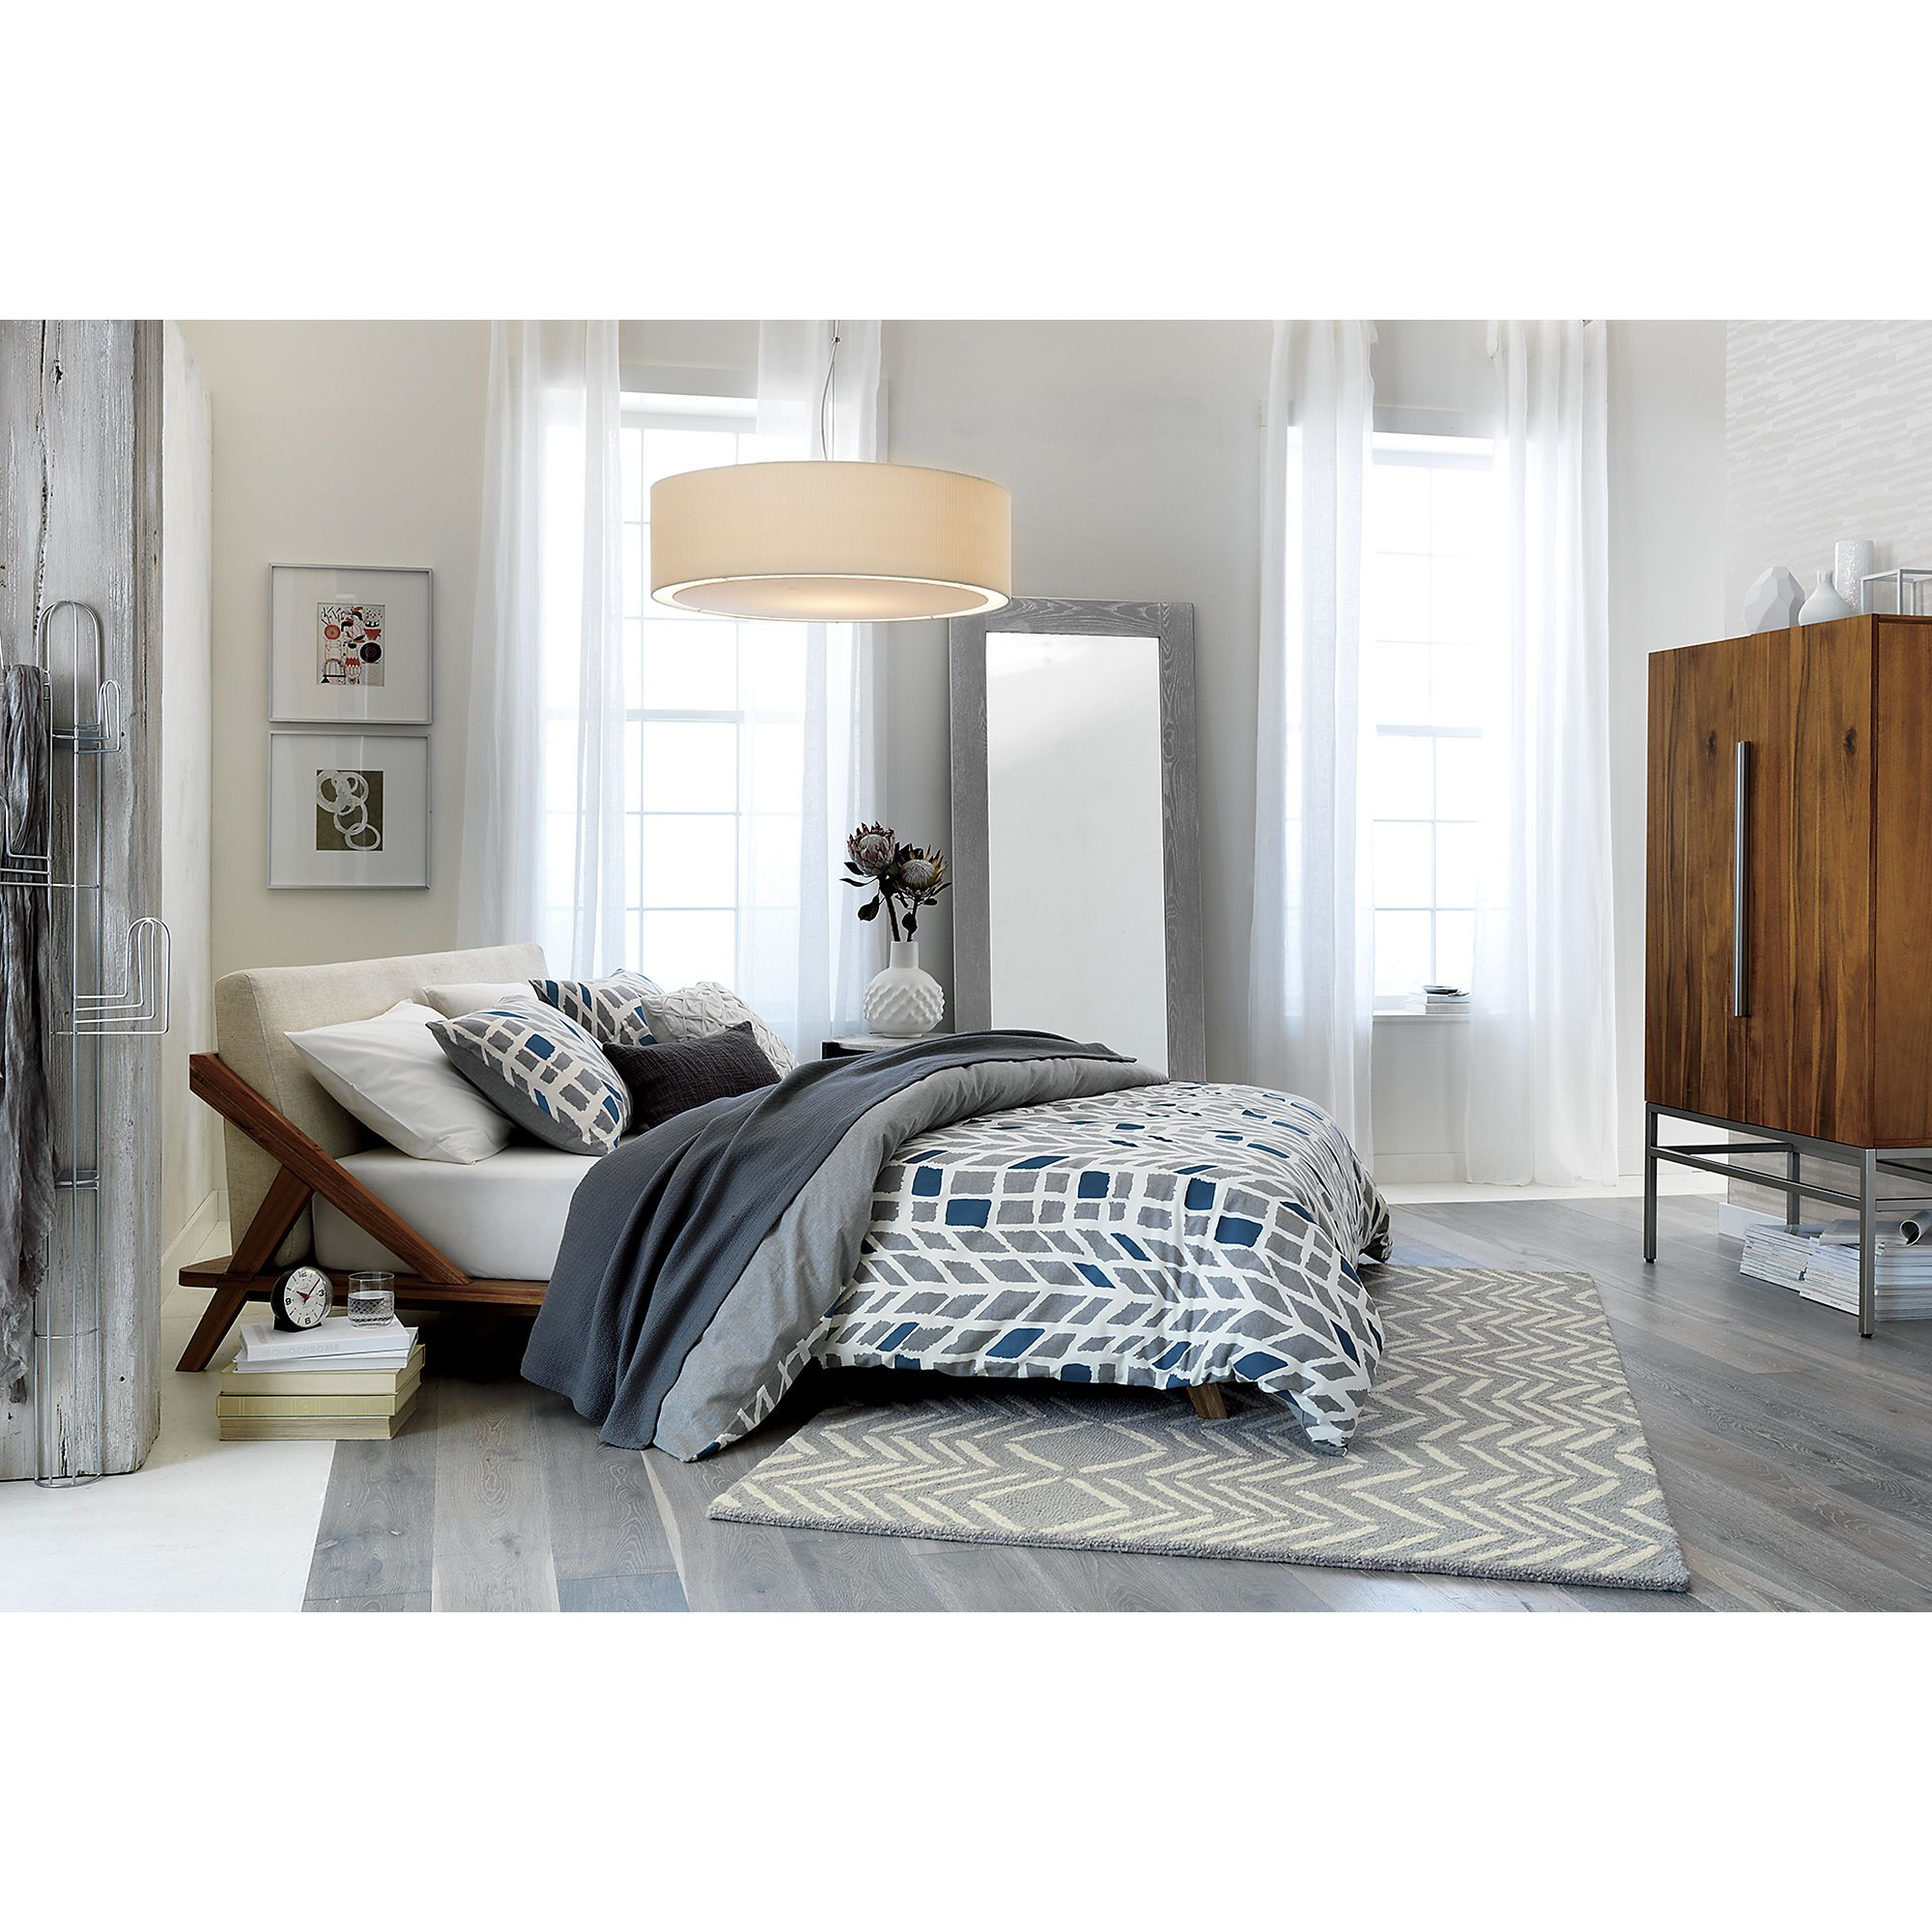 hash looped rug | CB2 | House/Furniture | Pinterest